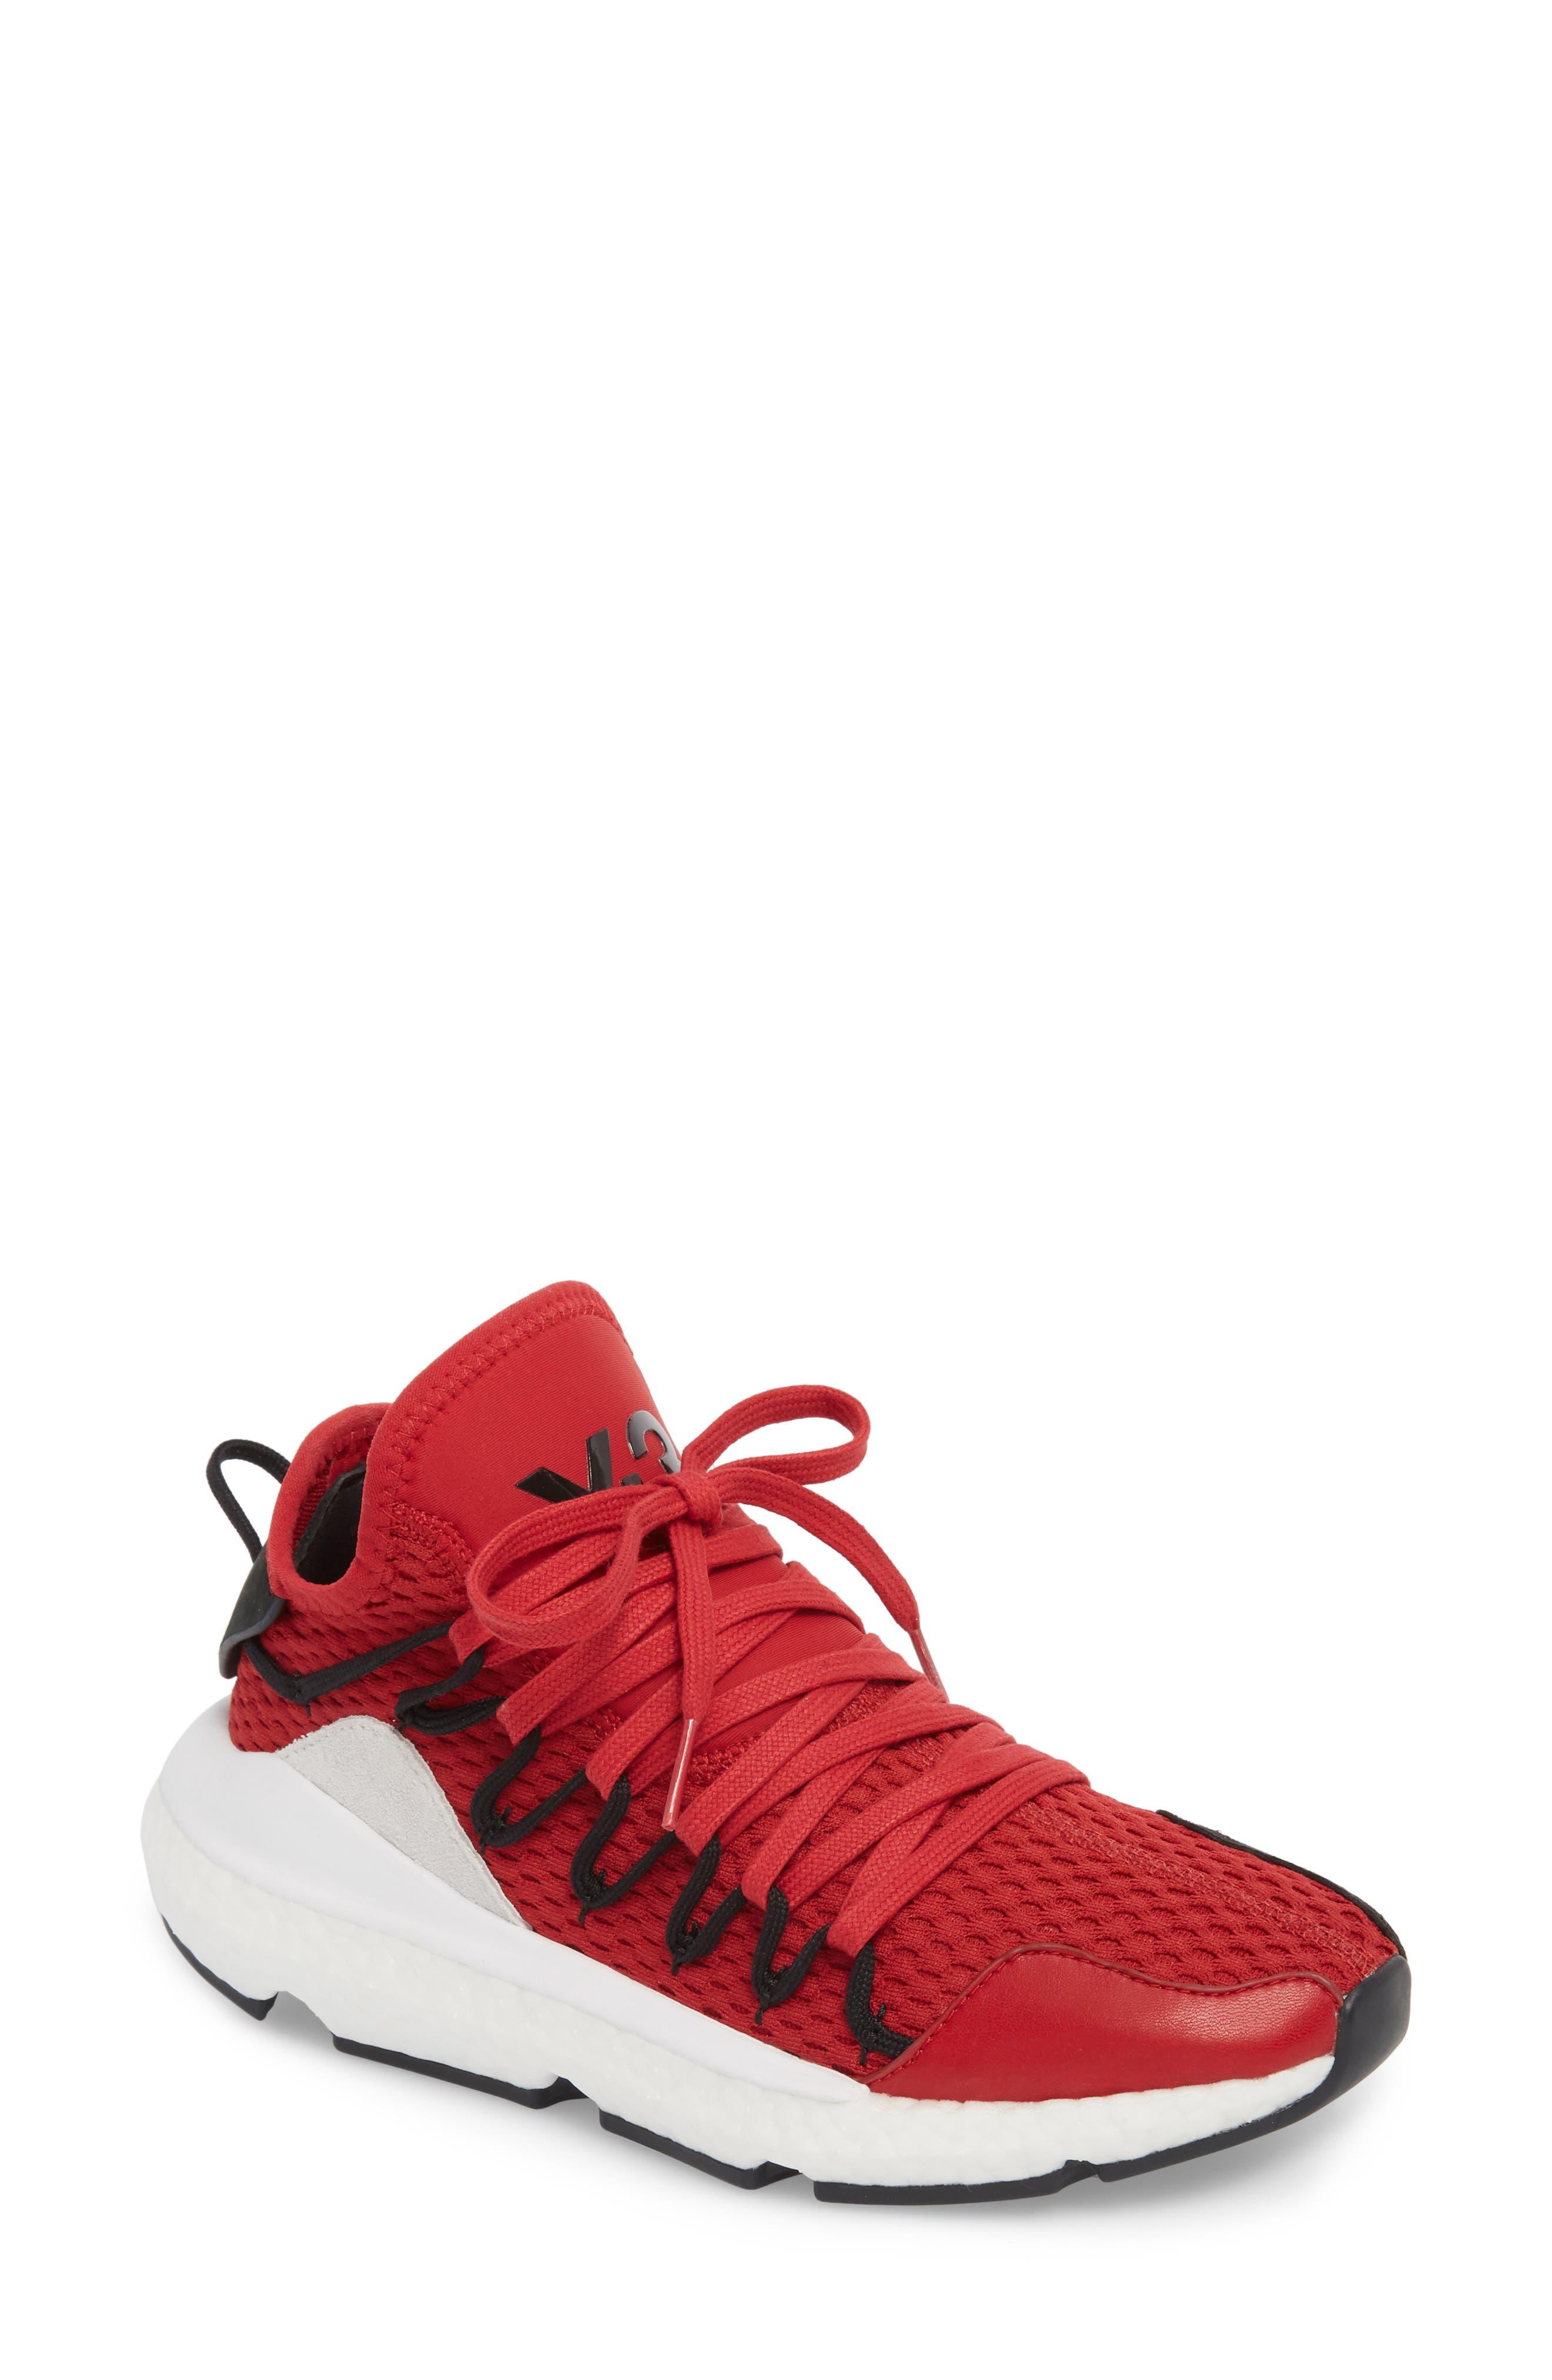 Y-3 Kusari Sneaker (Women)